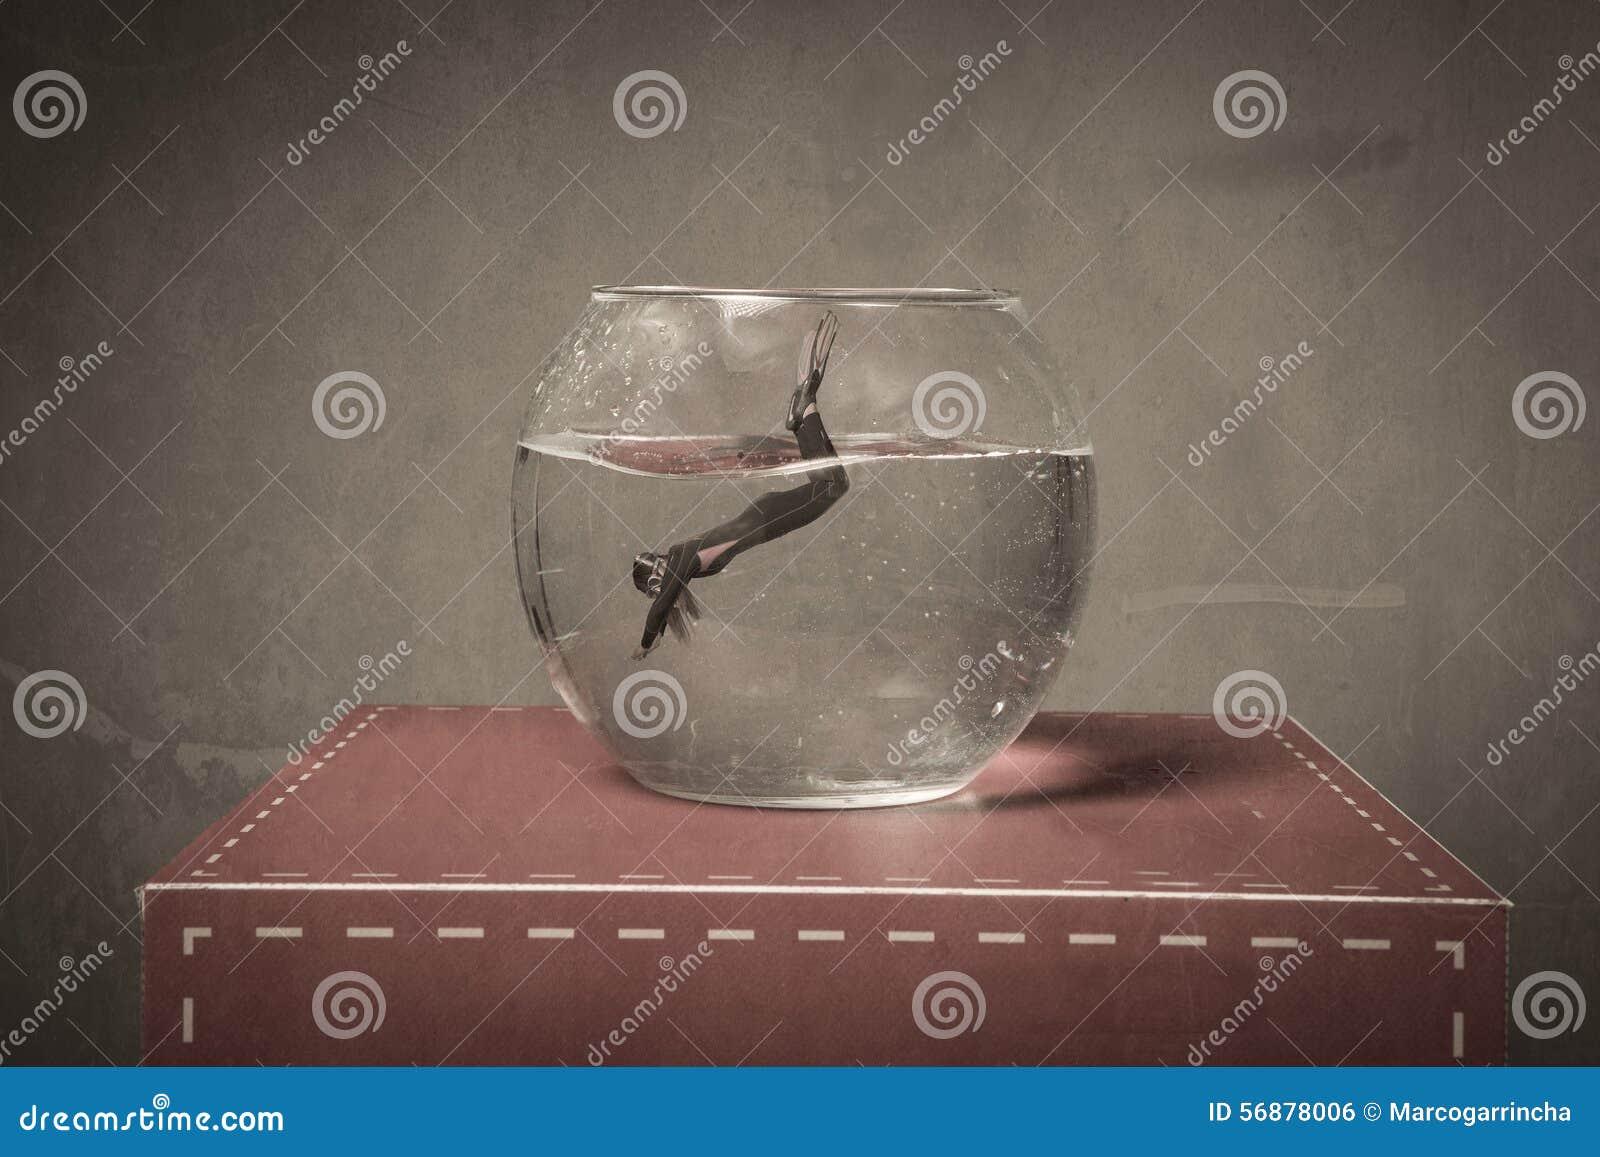 Immersion i en fiskbunke